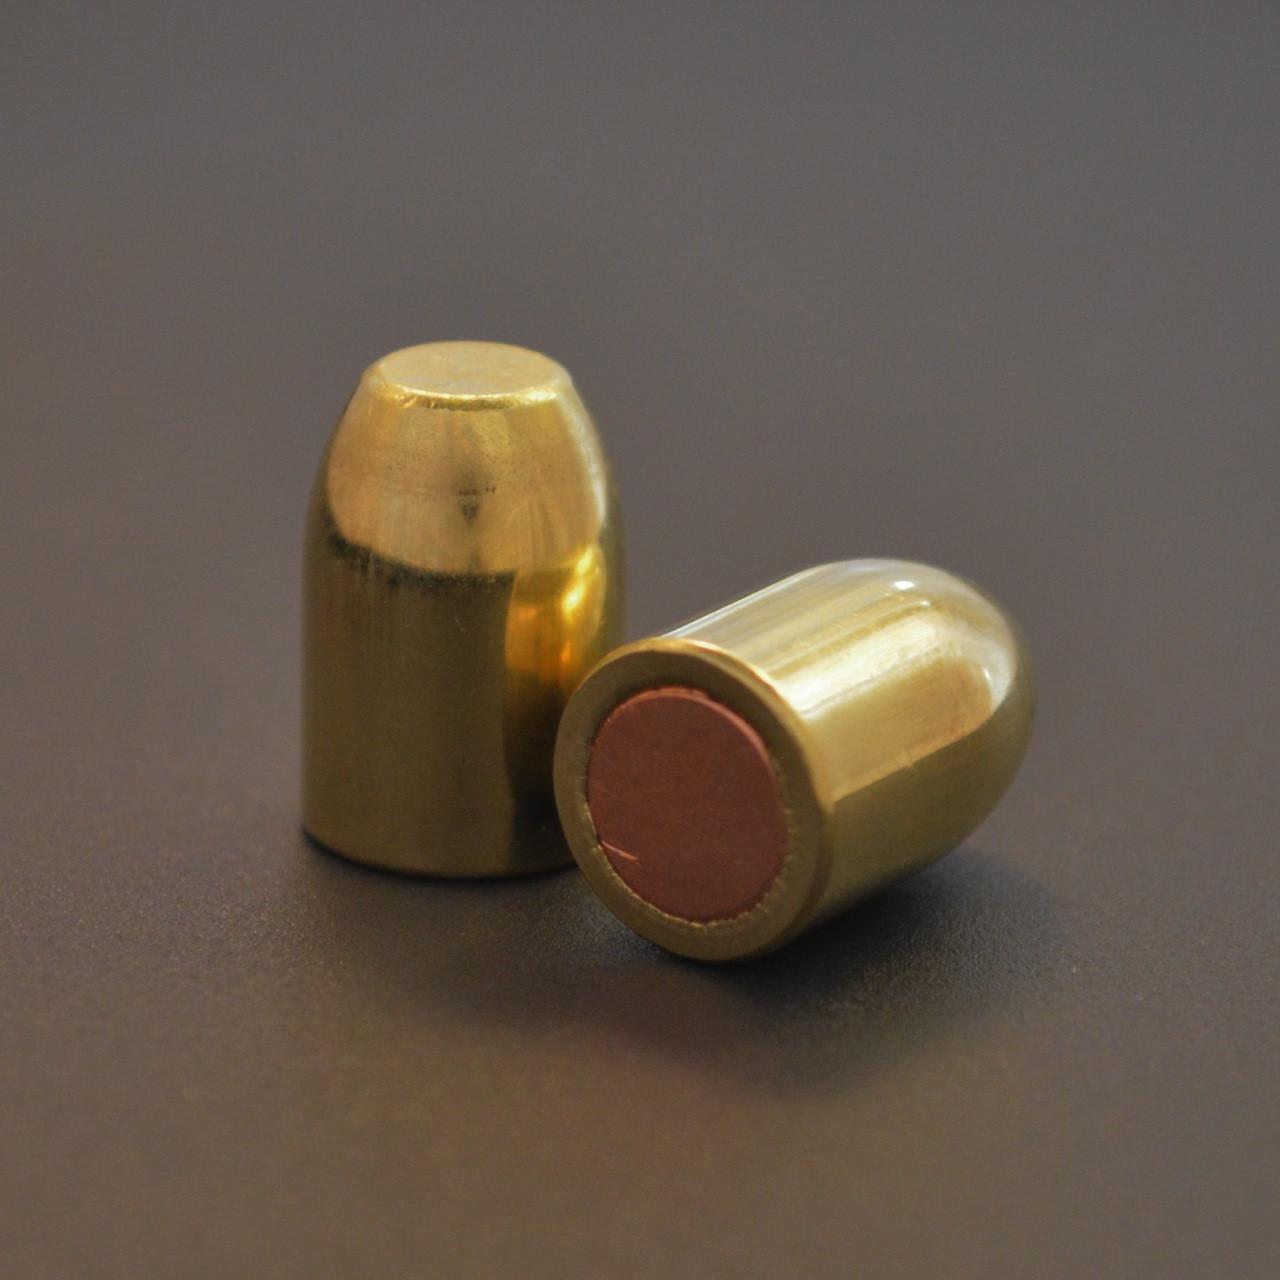 10mm/.40 180gr CMJ - 500ct